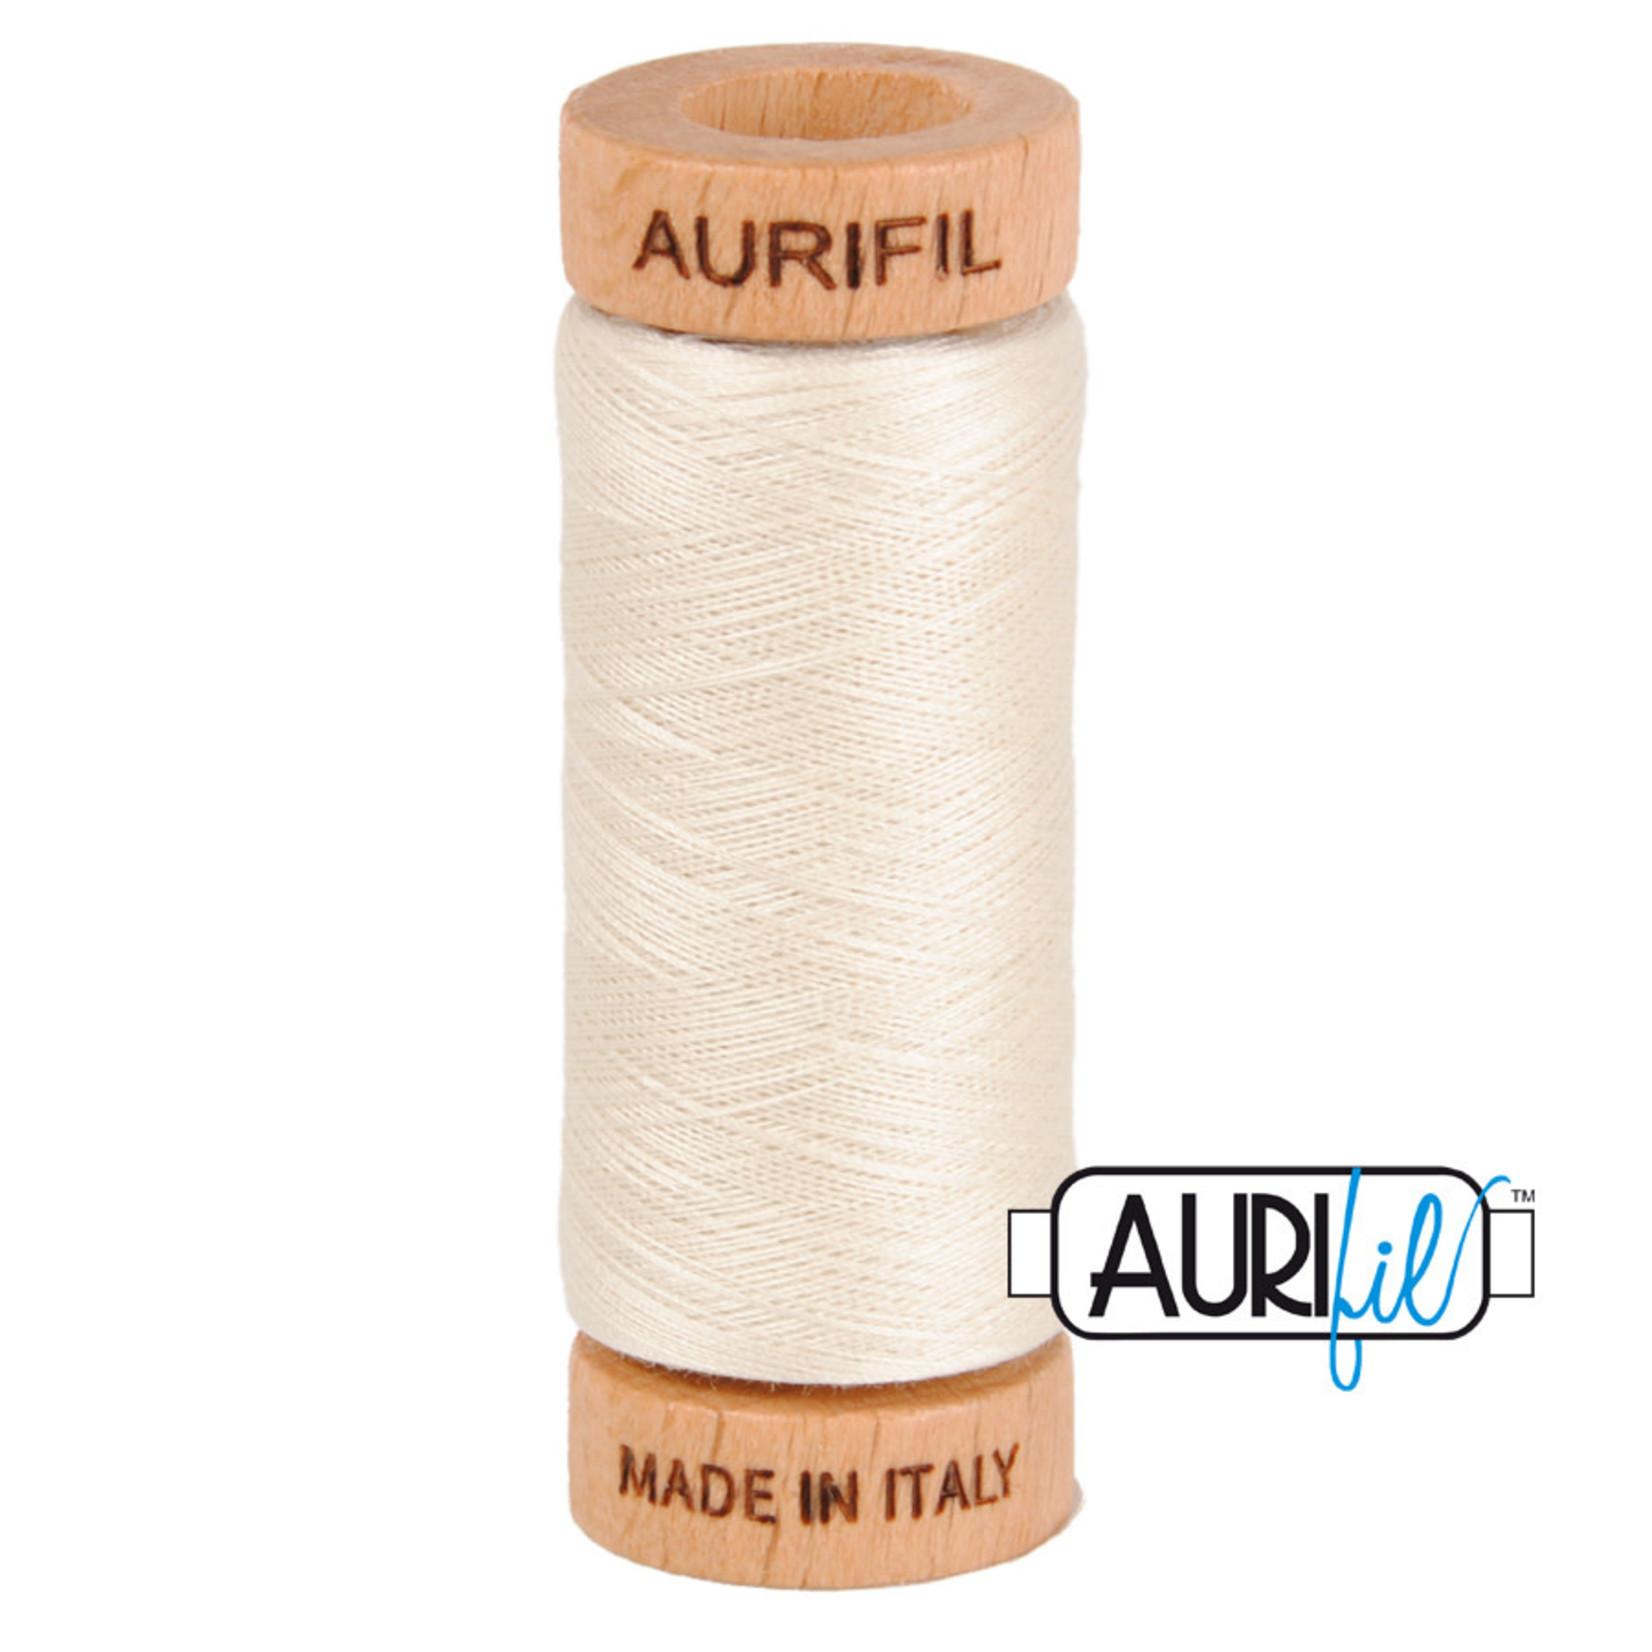 AURIFIL AURIFIL 80 WT Silver White 2309 COTTON FLOSS